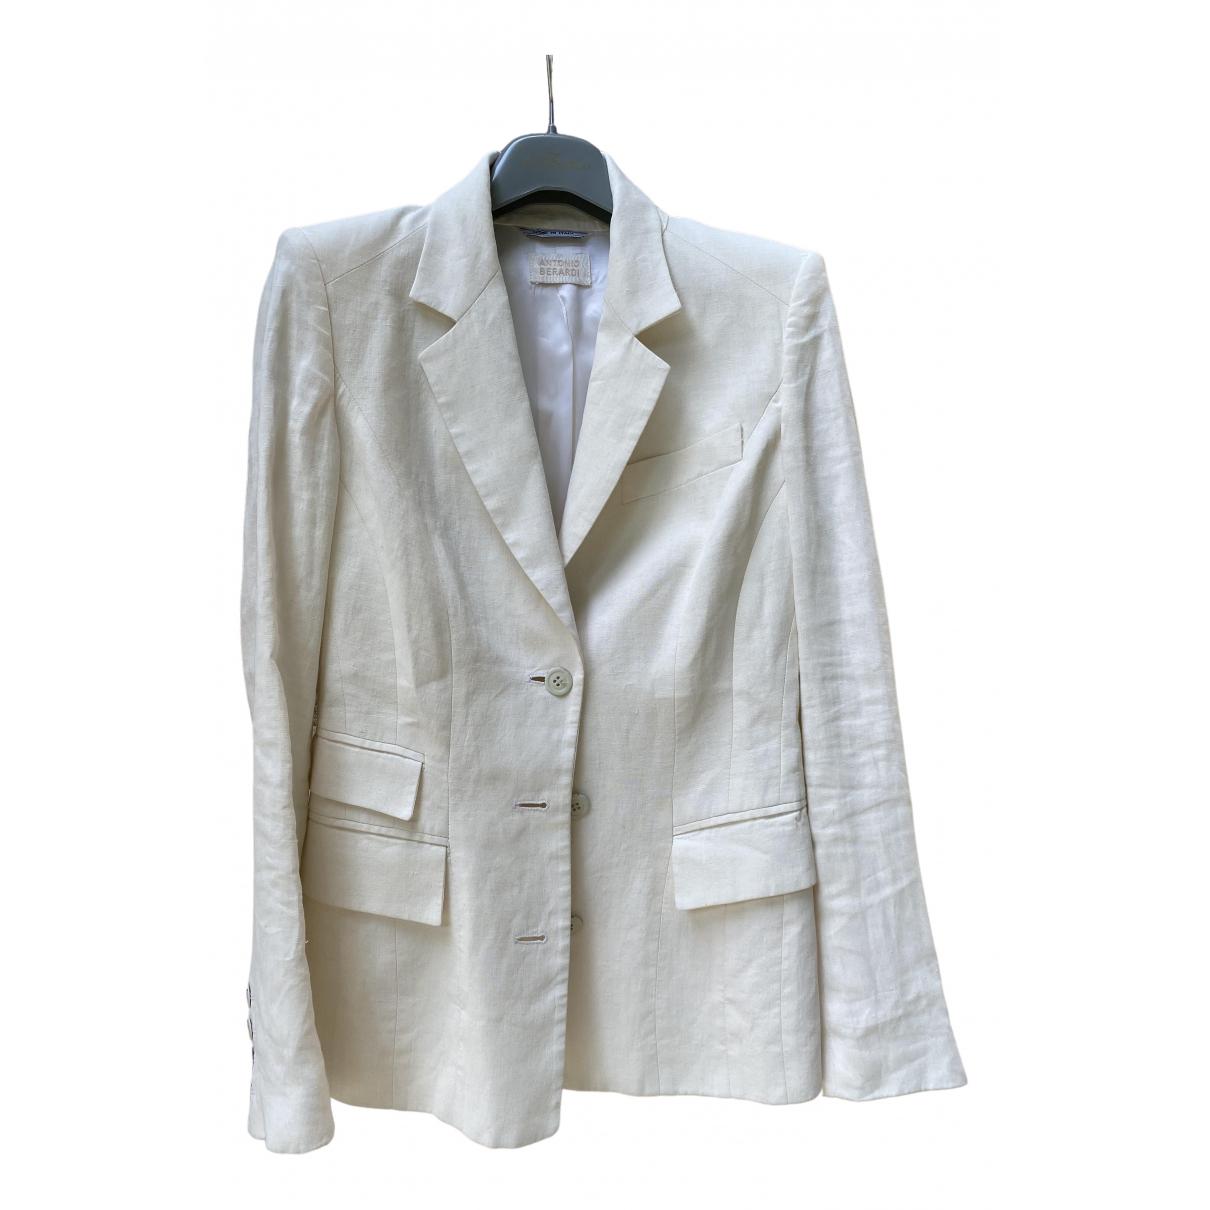 Antonio Berardi - Veste   pour femme en lin - blanc